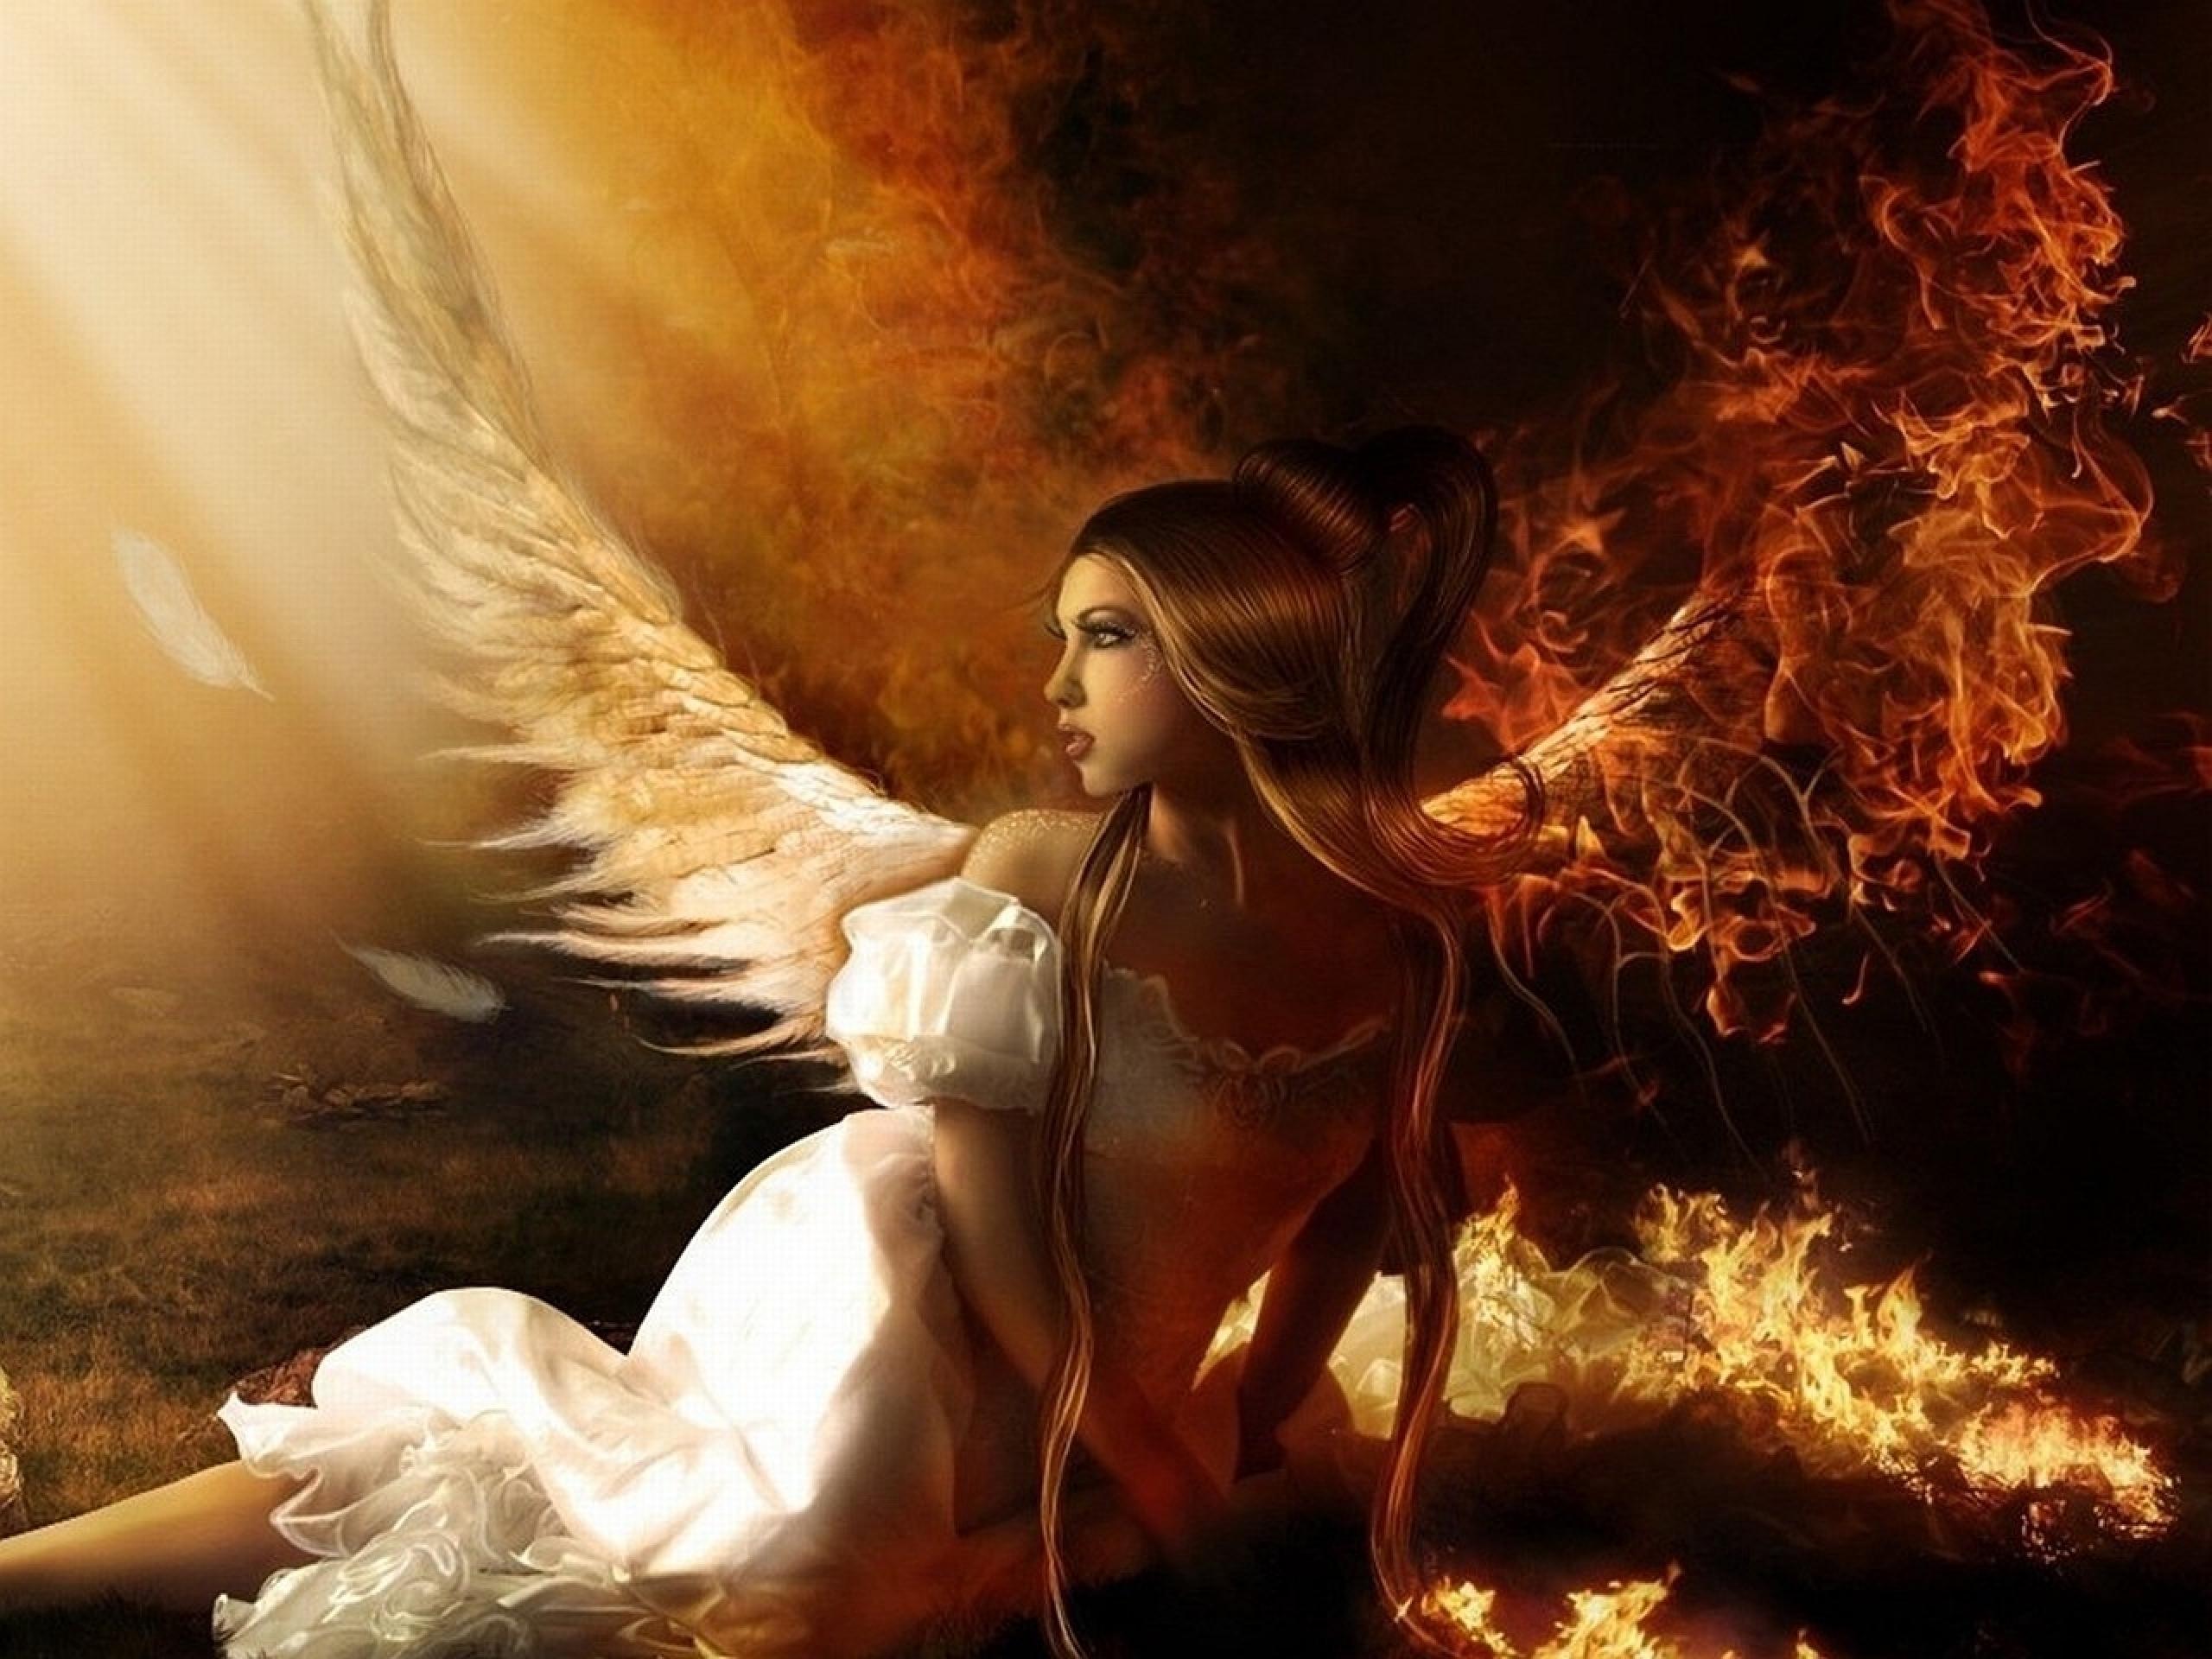 Fallen Angel on Fire   Dark Angels   Mystic Lands 2560x1920